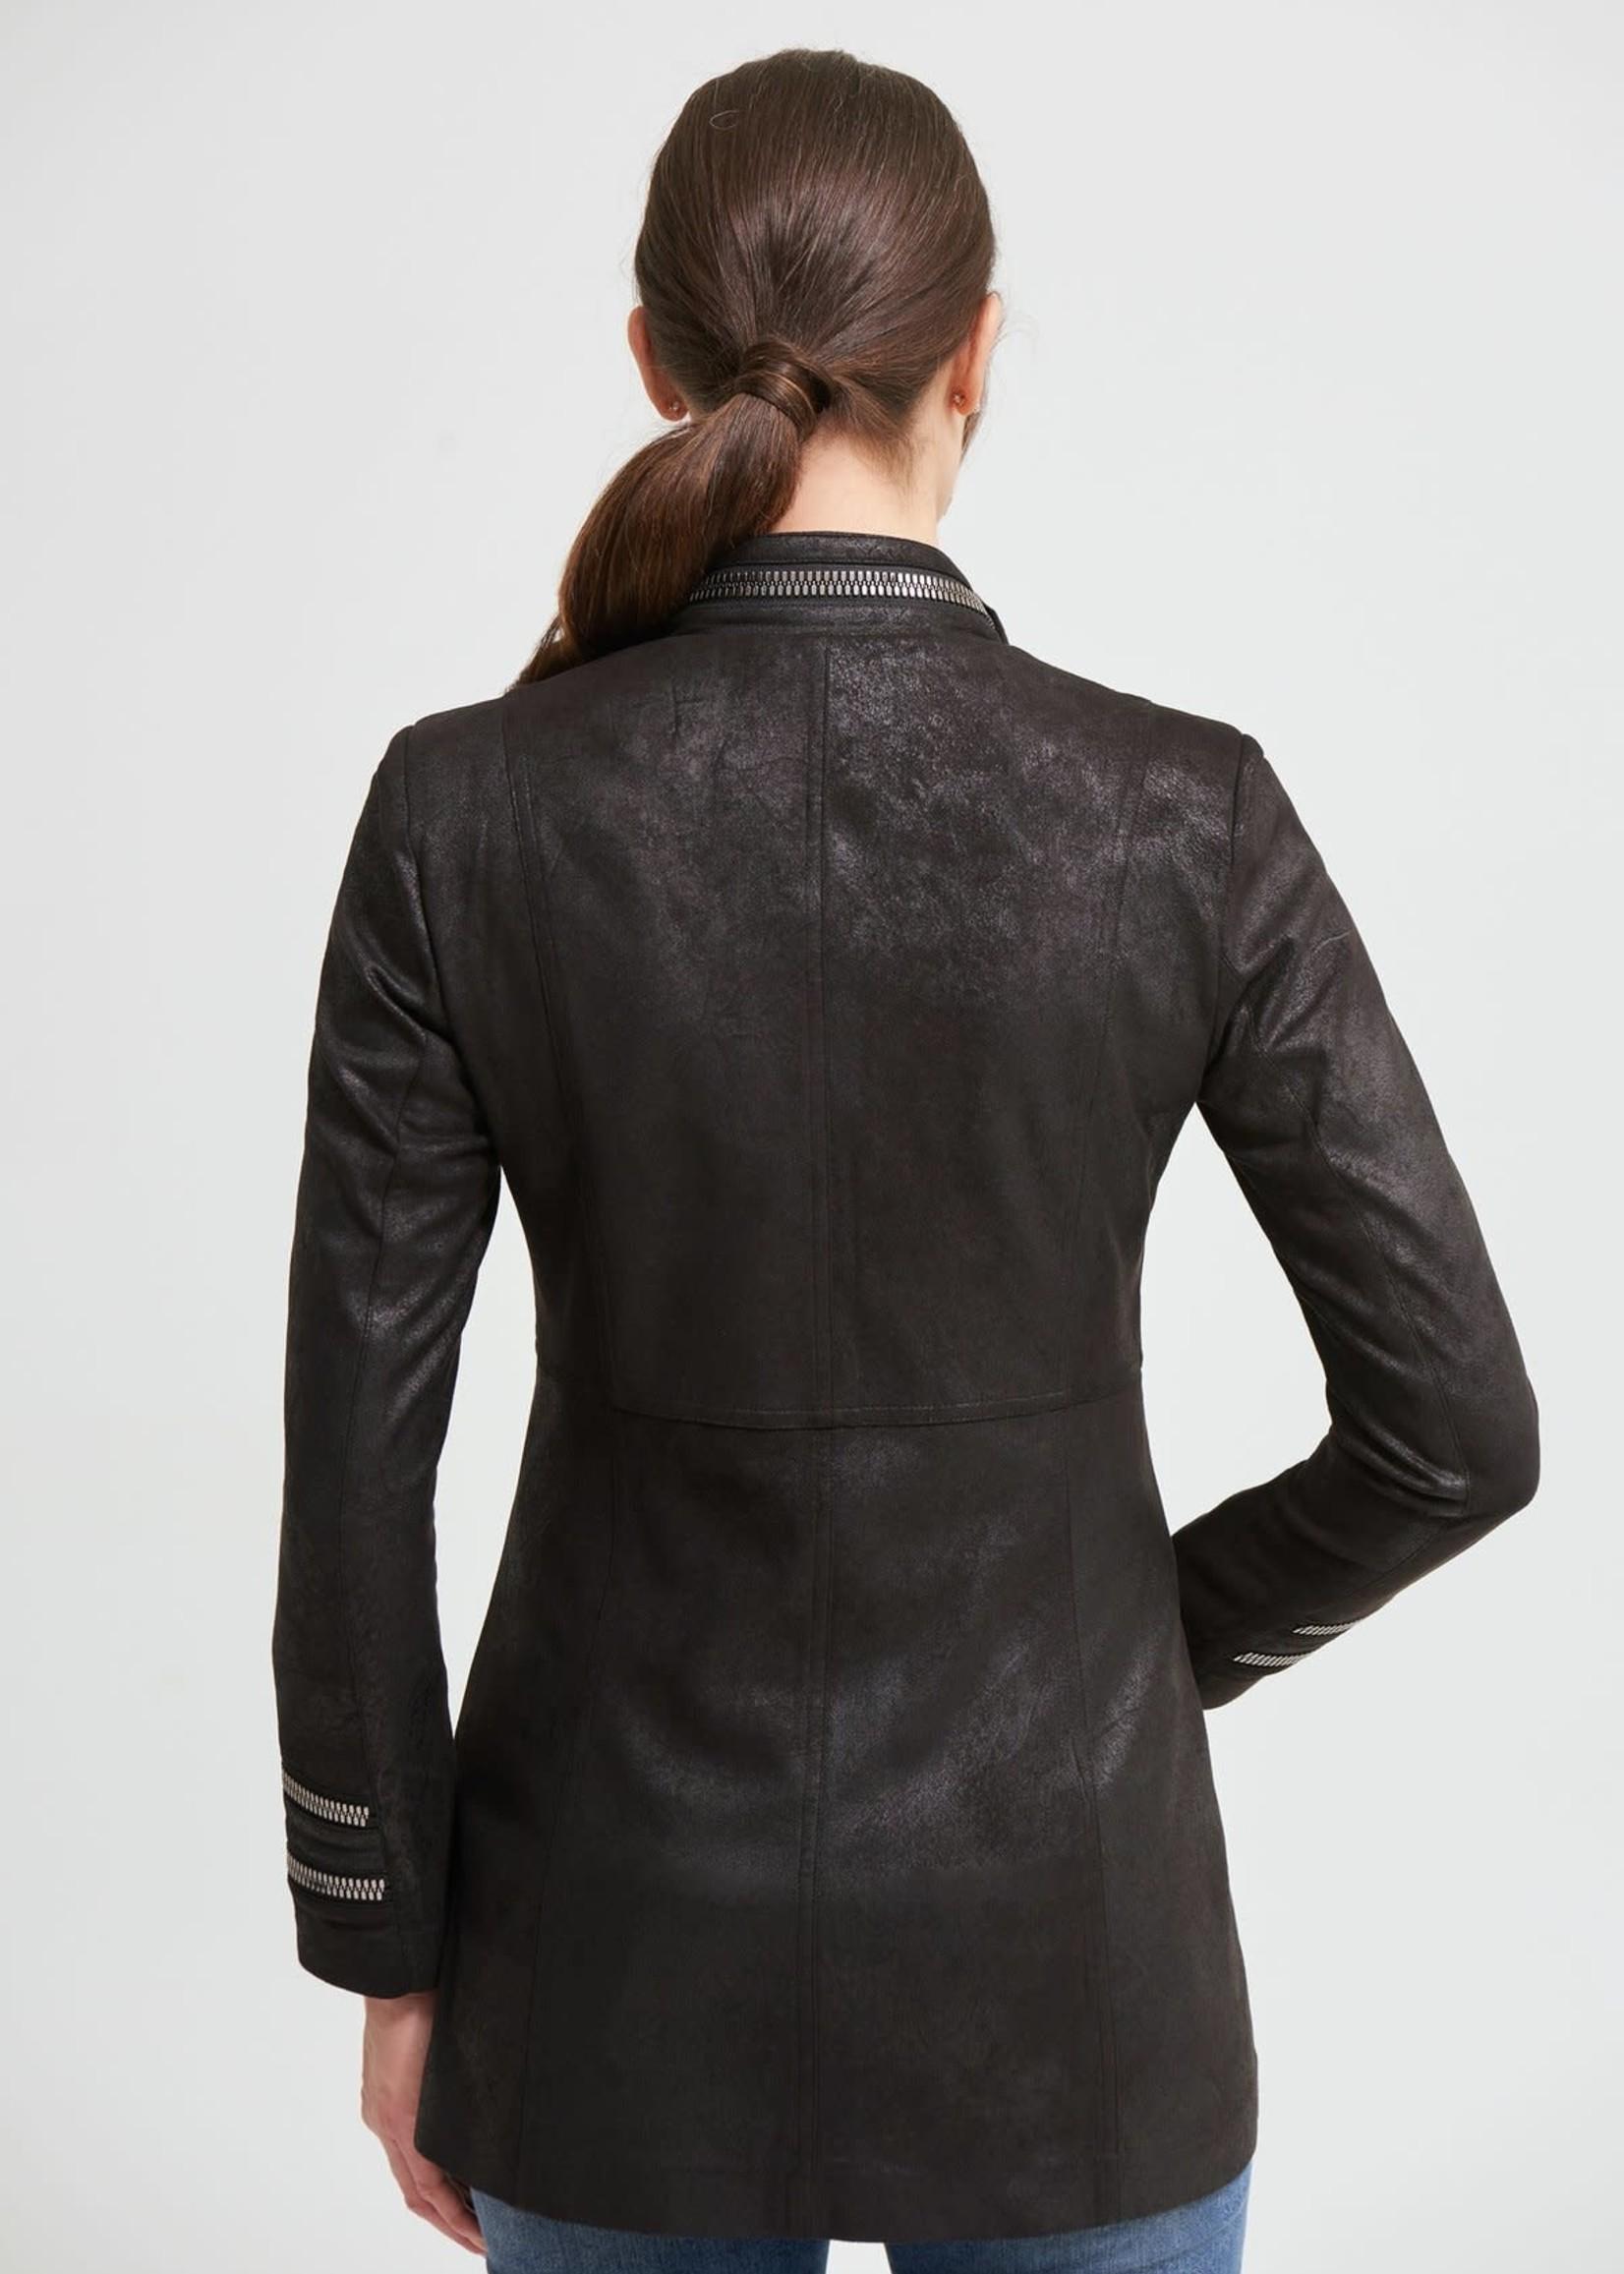 Joseph Ribkoff Joseph Ribkoff Faux Suede Jacket w/ Zipper Accents